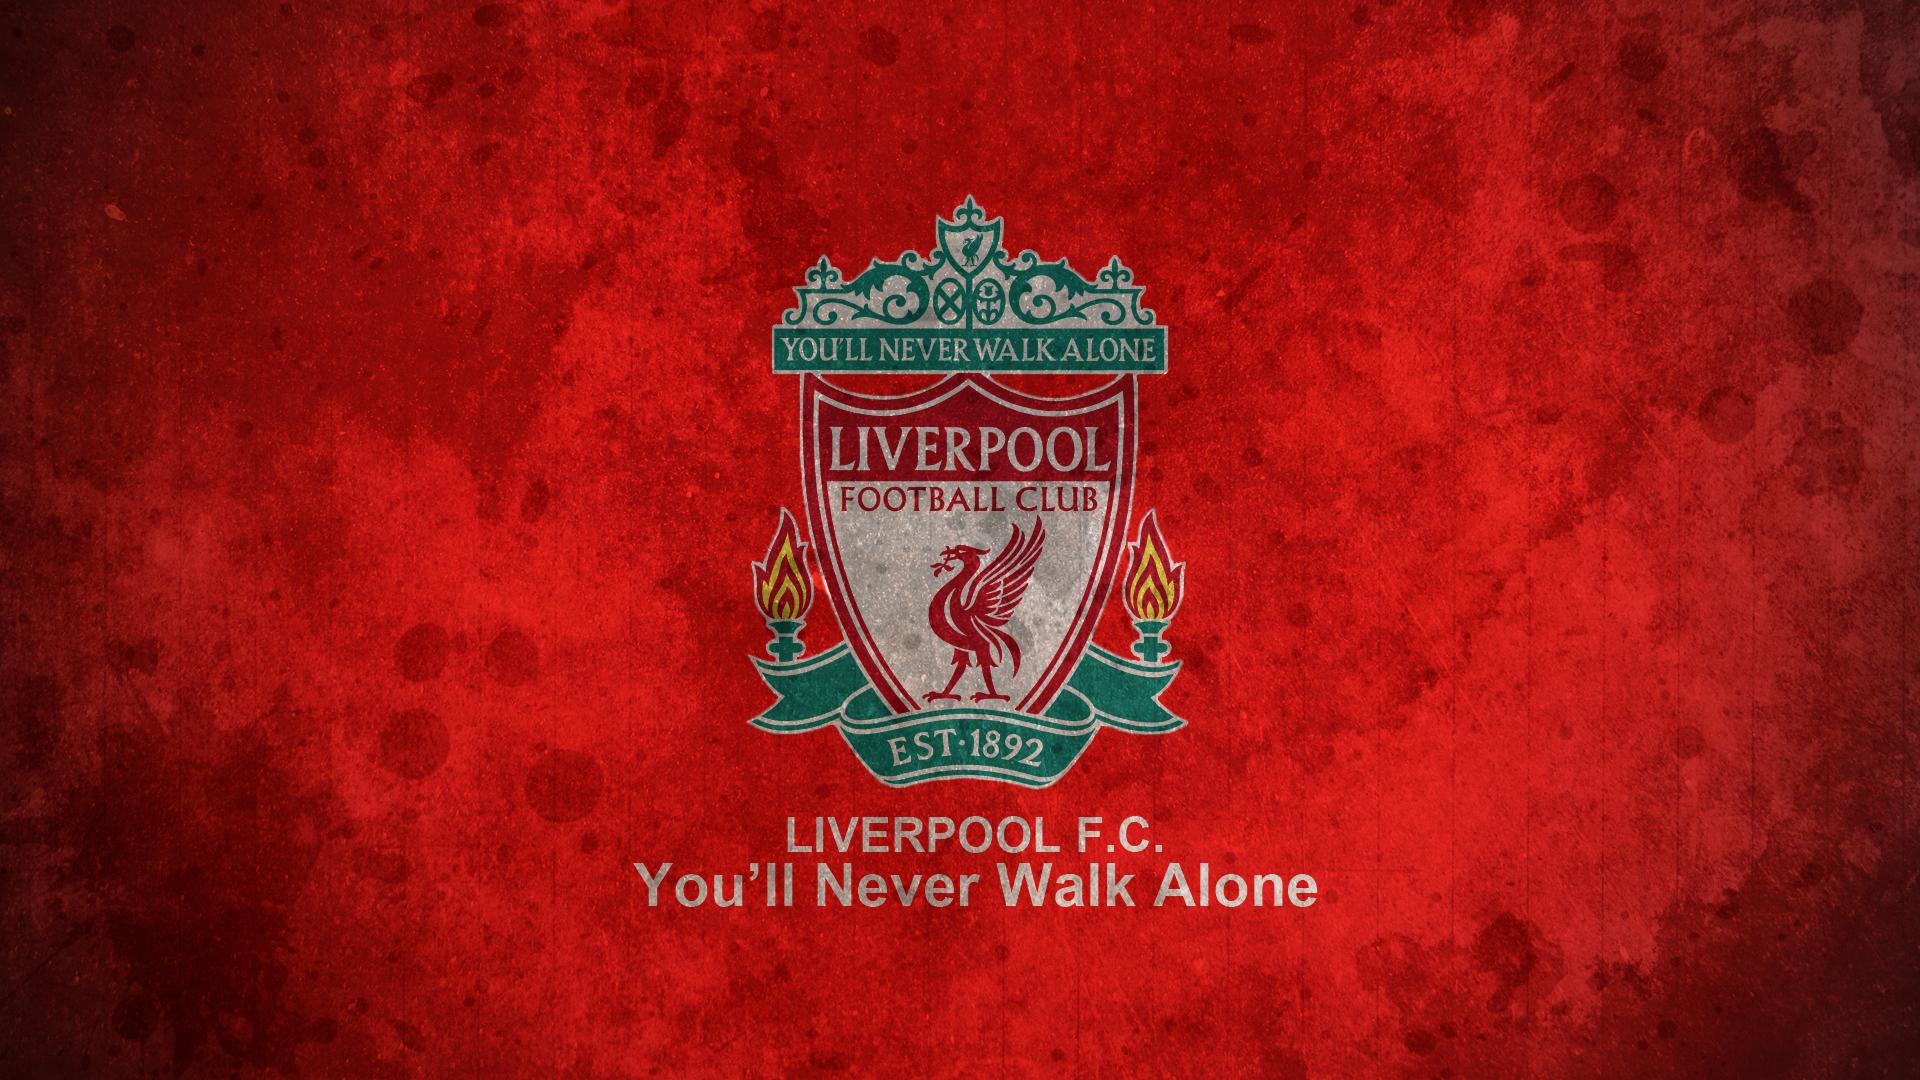 Liverpool HD desktop wallpaper Liverpool wallpapers 1920x1080